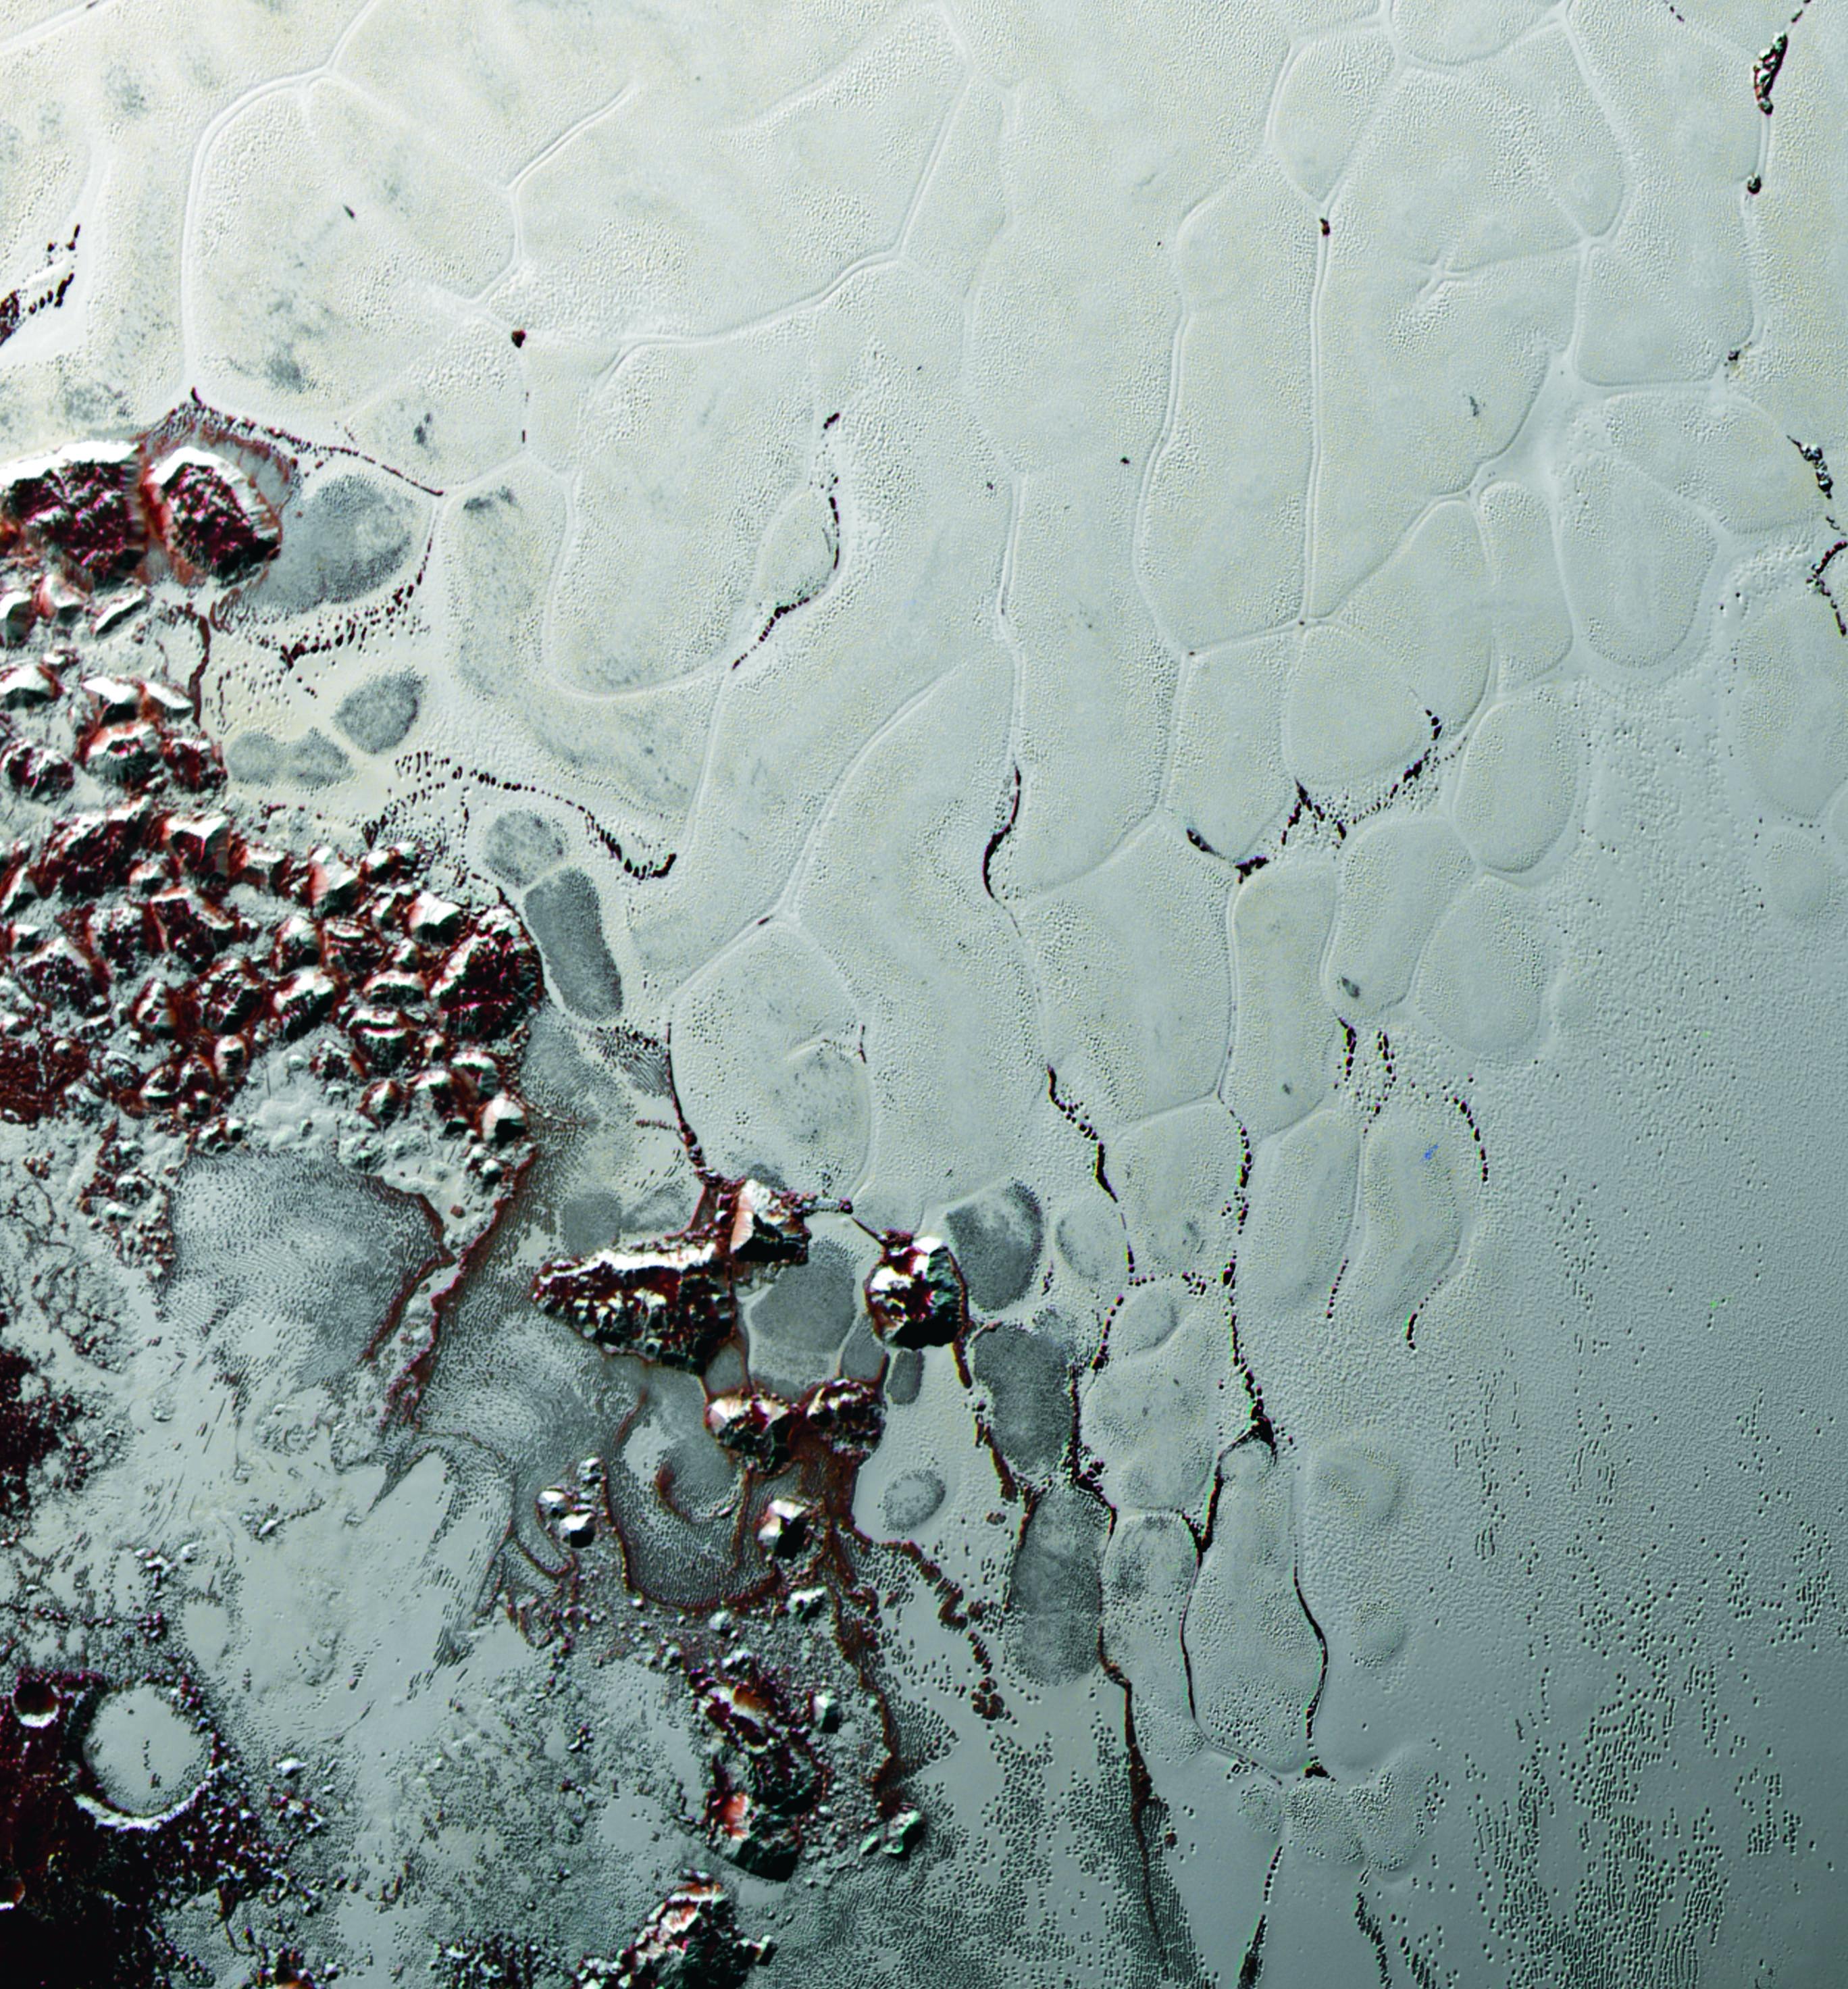 Pluto S Heart Like A Cosmic Lava Lamp Nasa